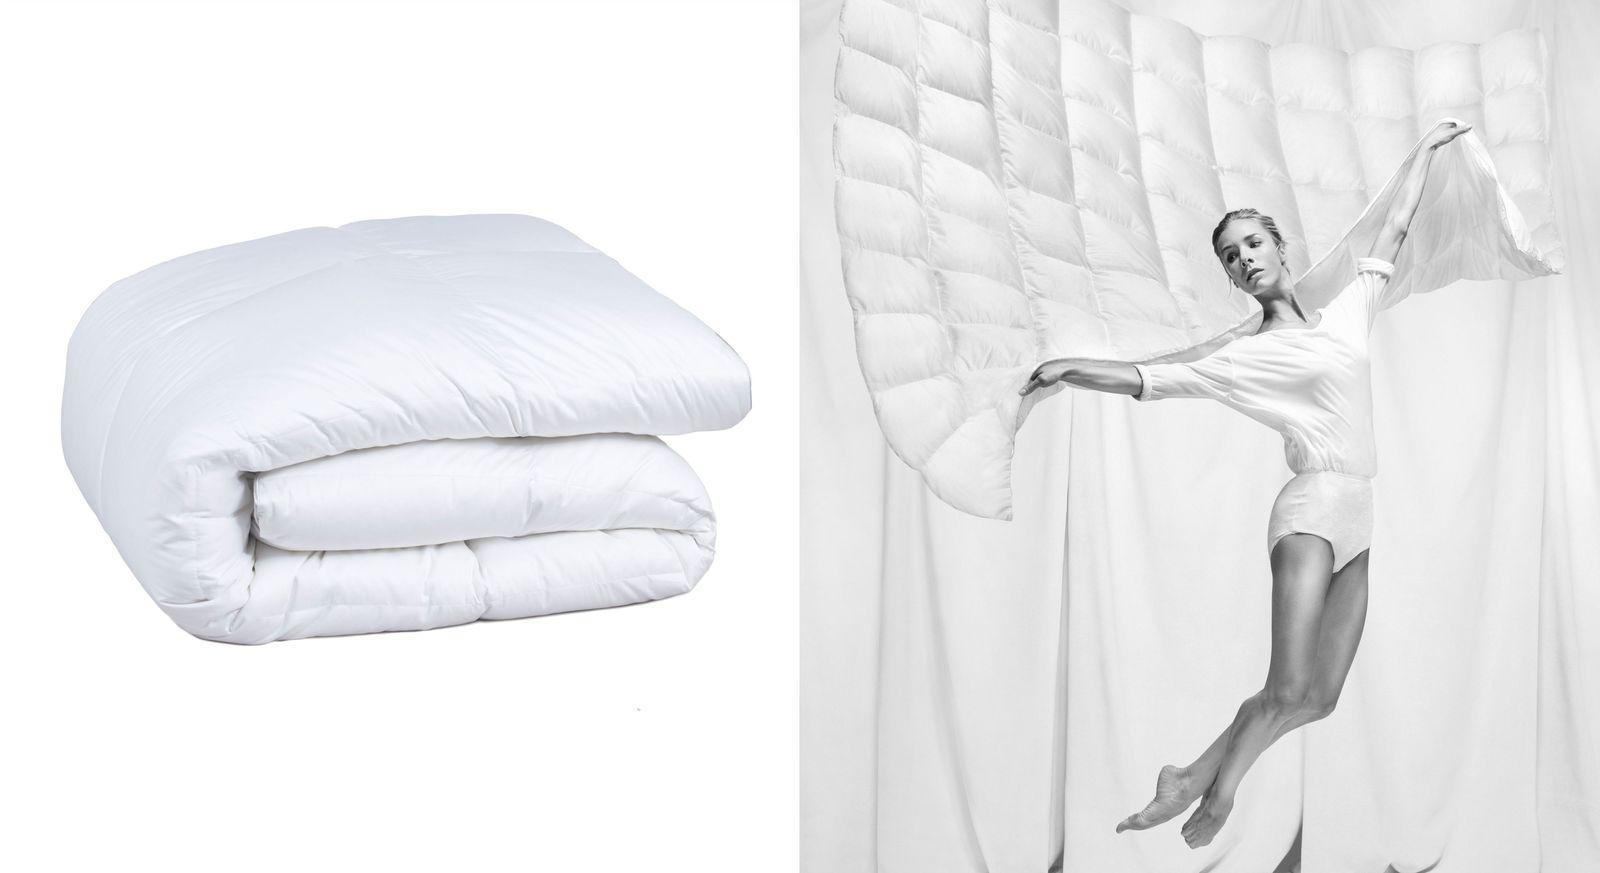 Daunen-Bettdecke Pyrenex royal medium mit Jacquard-Bezug aus Baumwolle